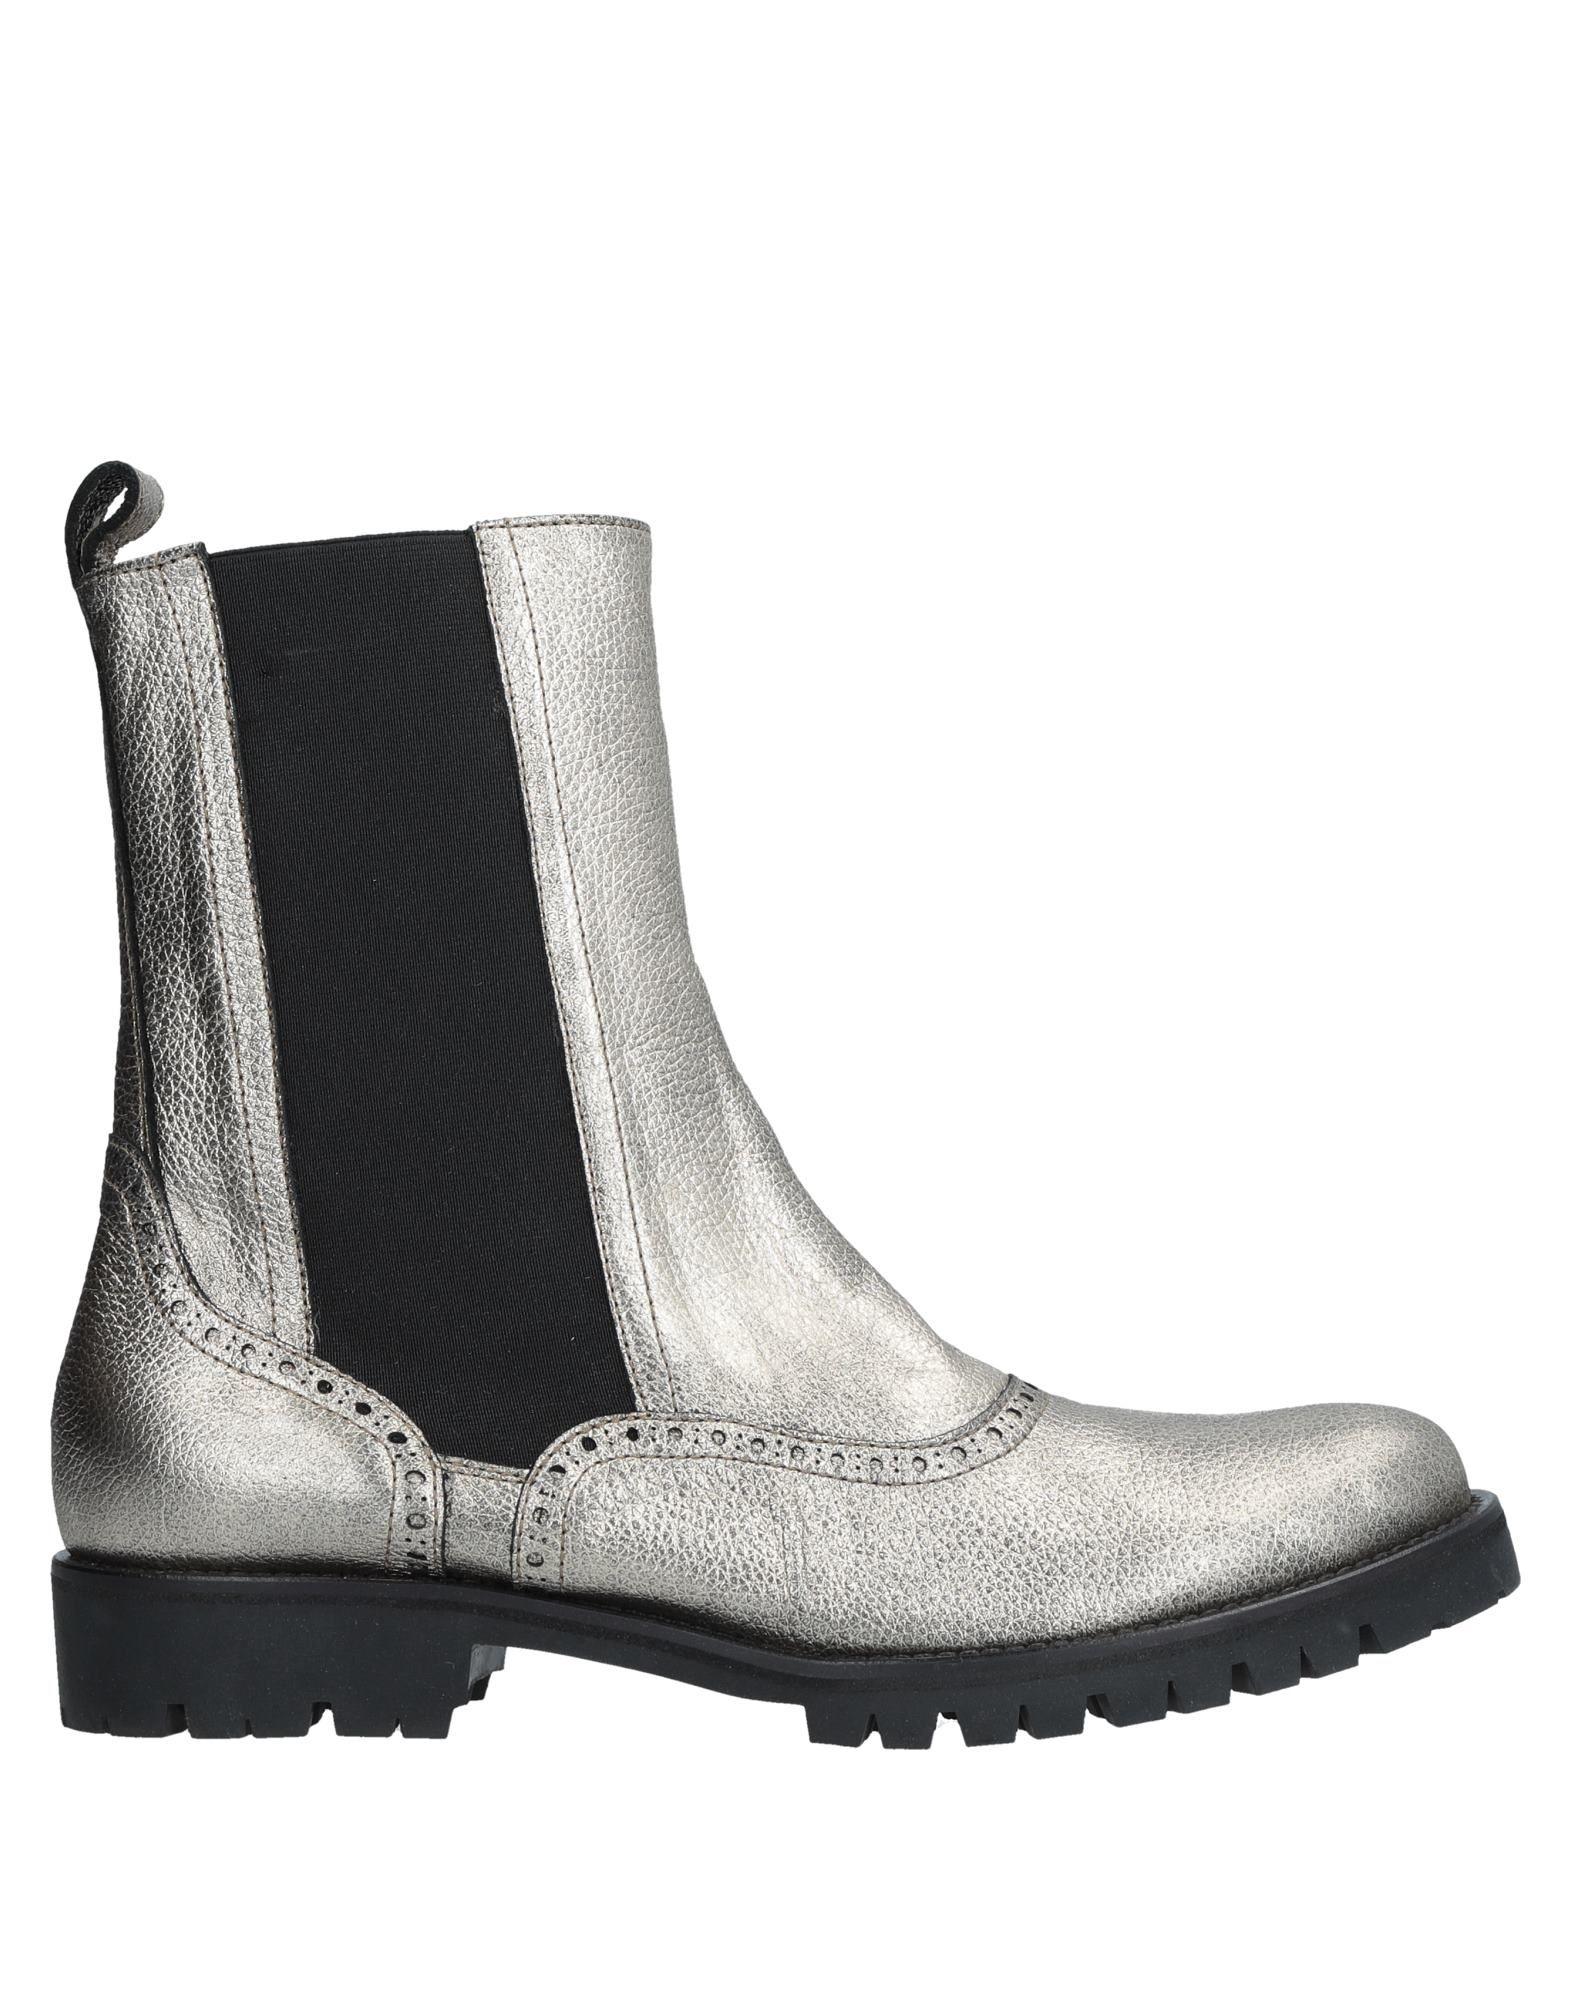 Rabatt Schuhe Peter Damen Flowers Chelsea Boots Damen Peter  11539250SB 8ea82e